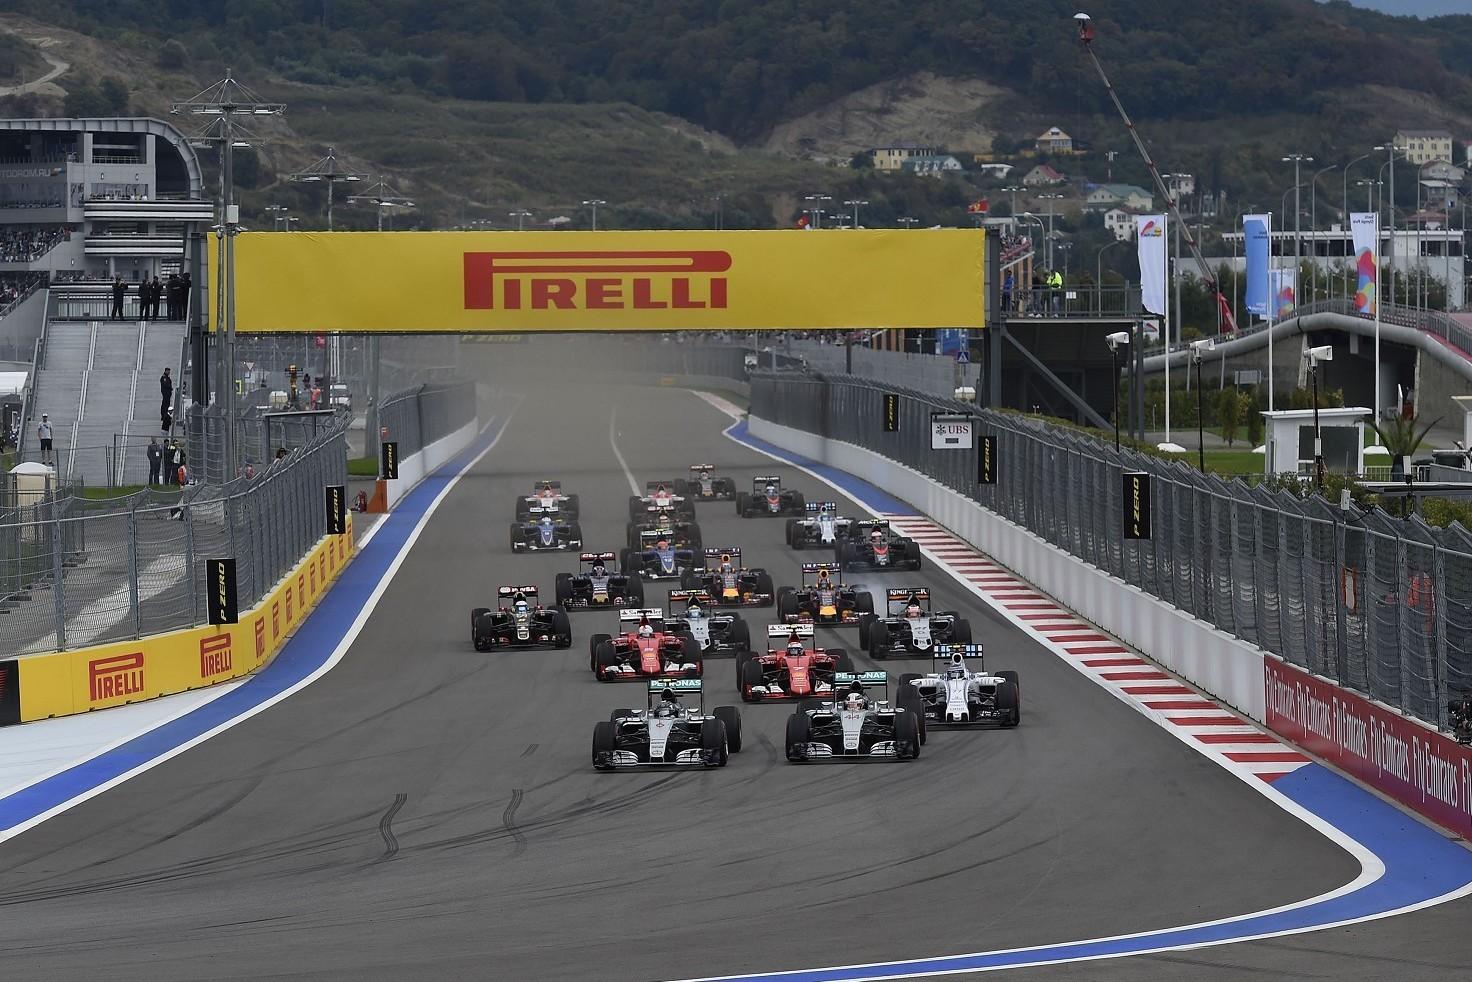 F1 LIVE STREAMING GRATIS